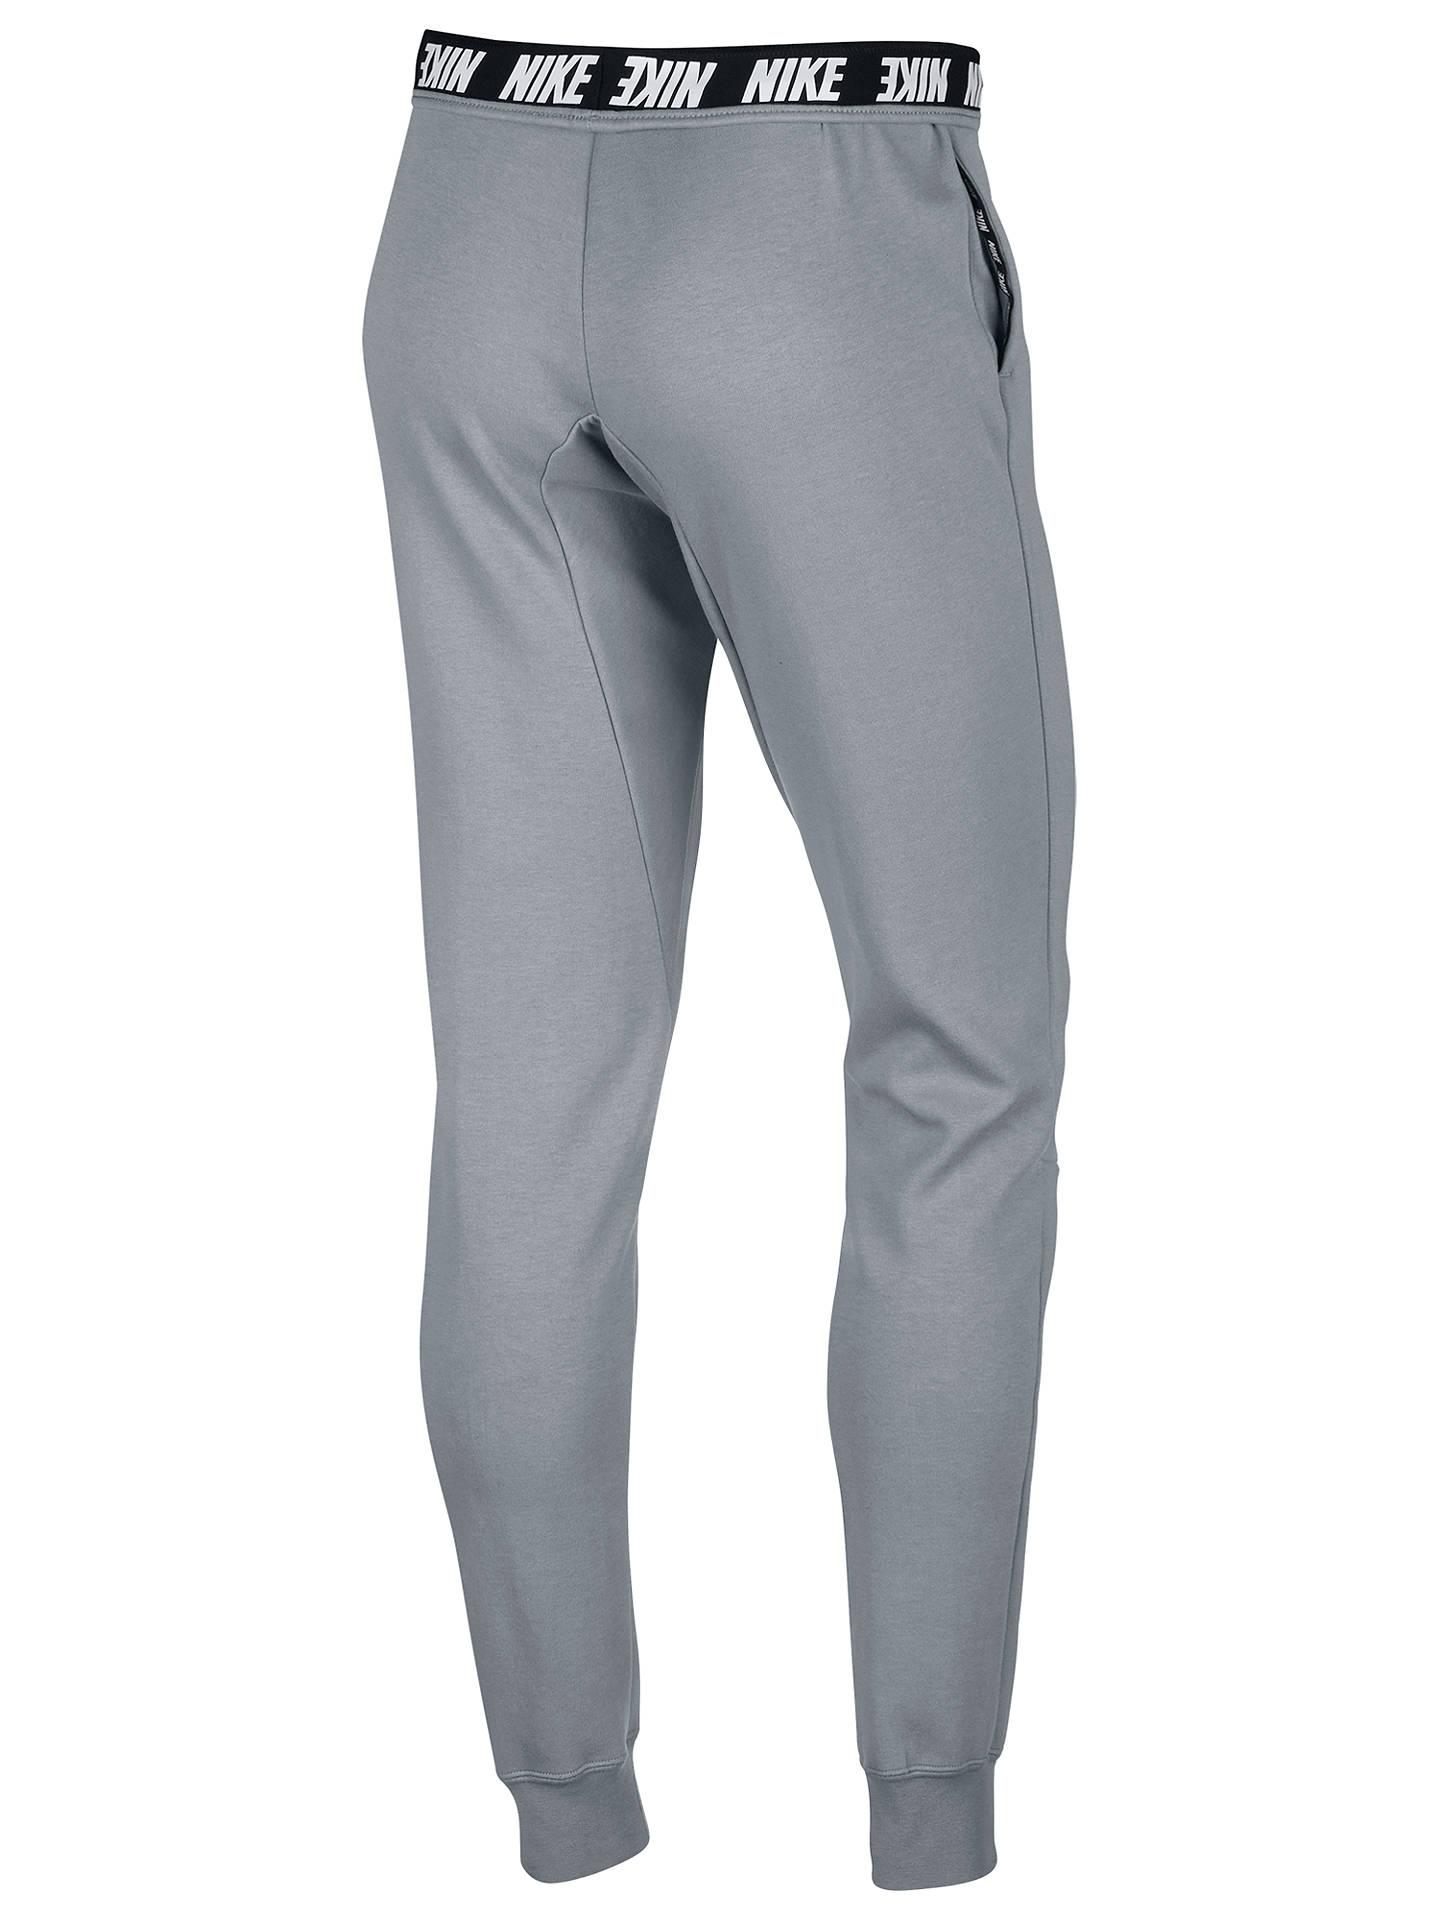 Nike Sportswear Optic Tracksuit Bottoms at John Lewis & Partners